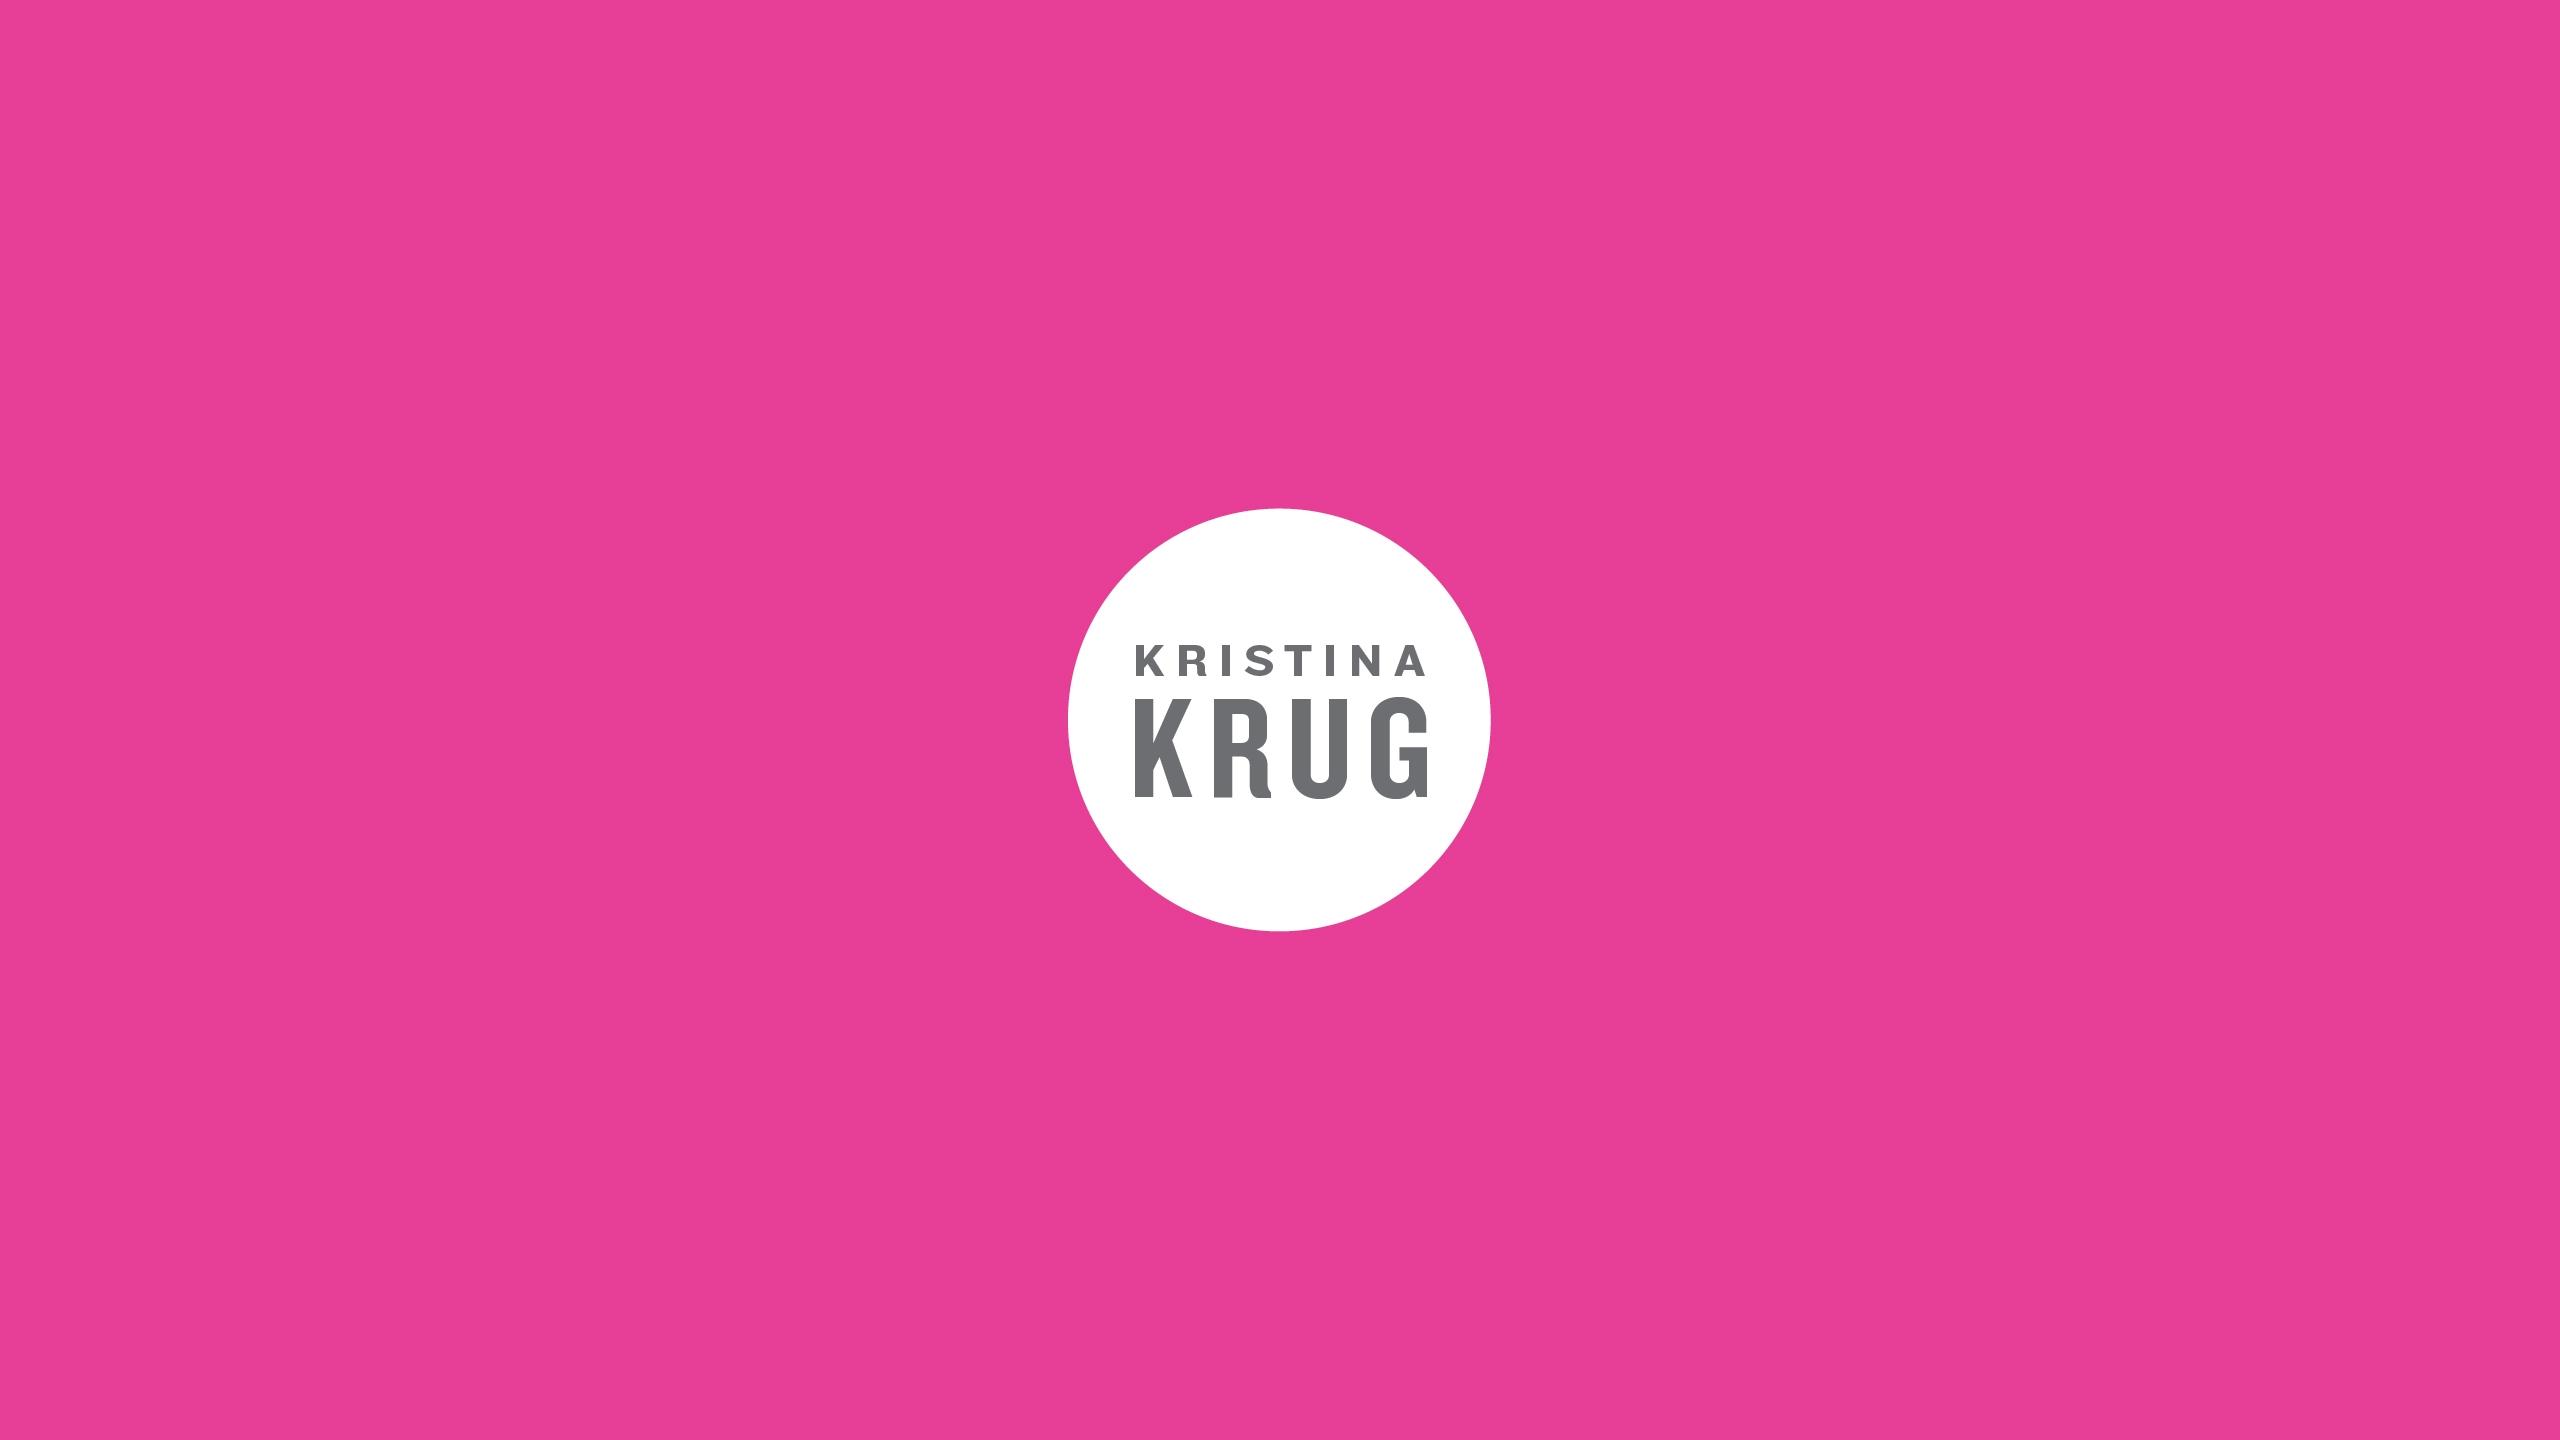 Kristina Krug, Photographer + Director (@kristinakrug) Cover Image